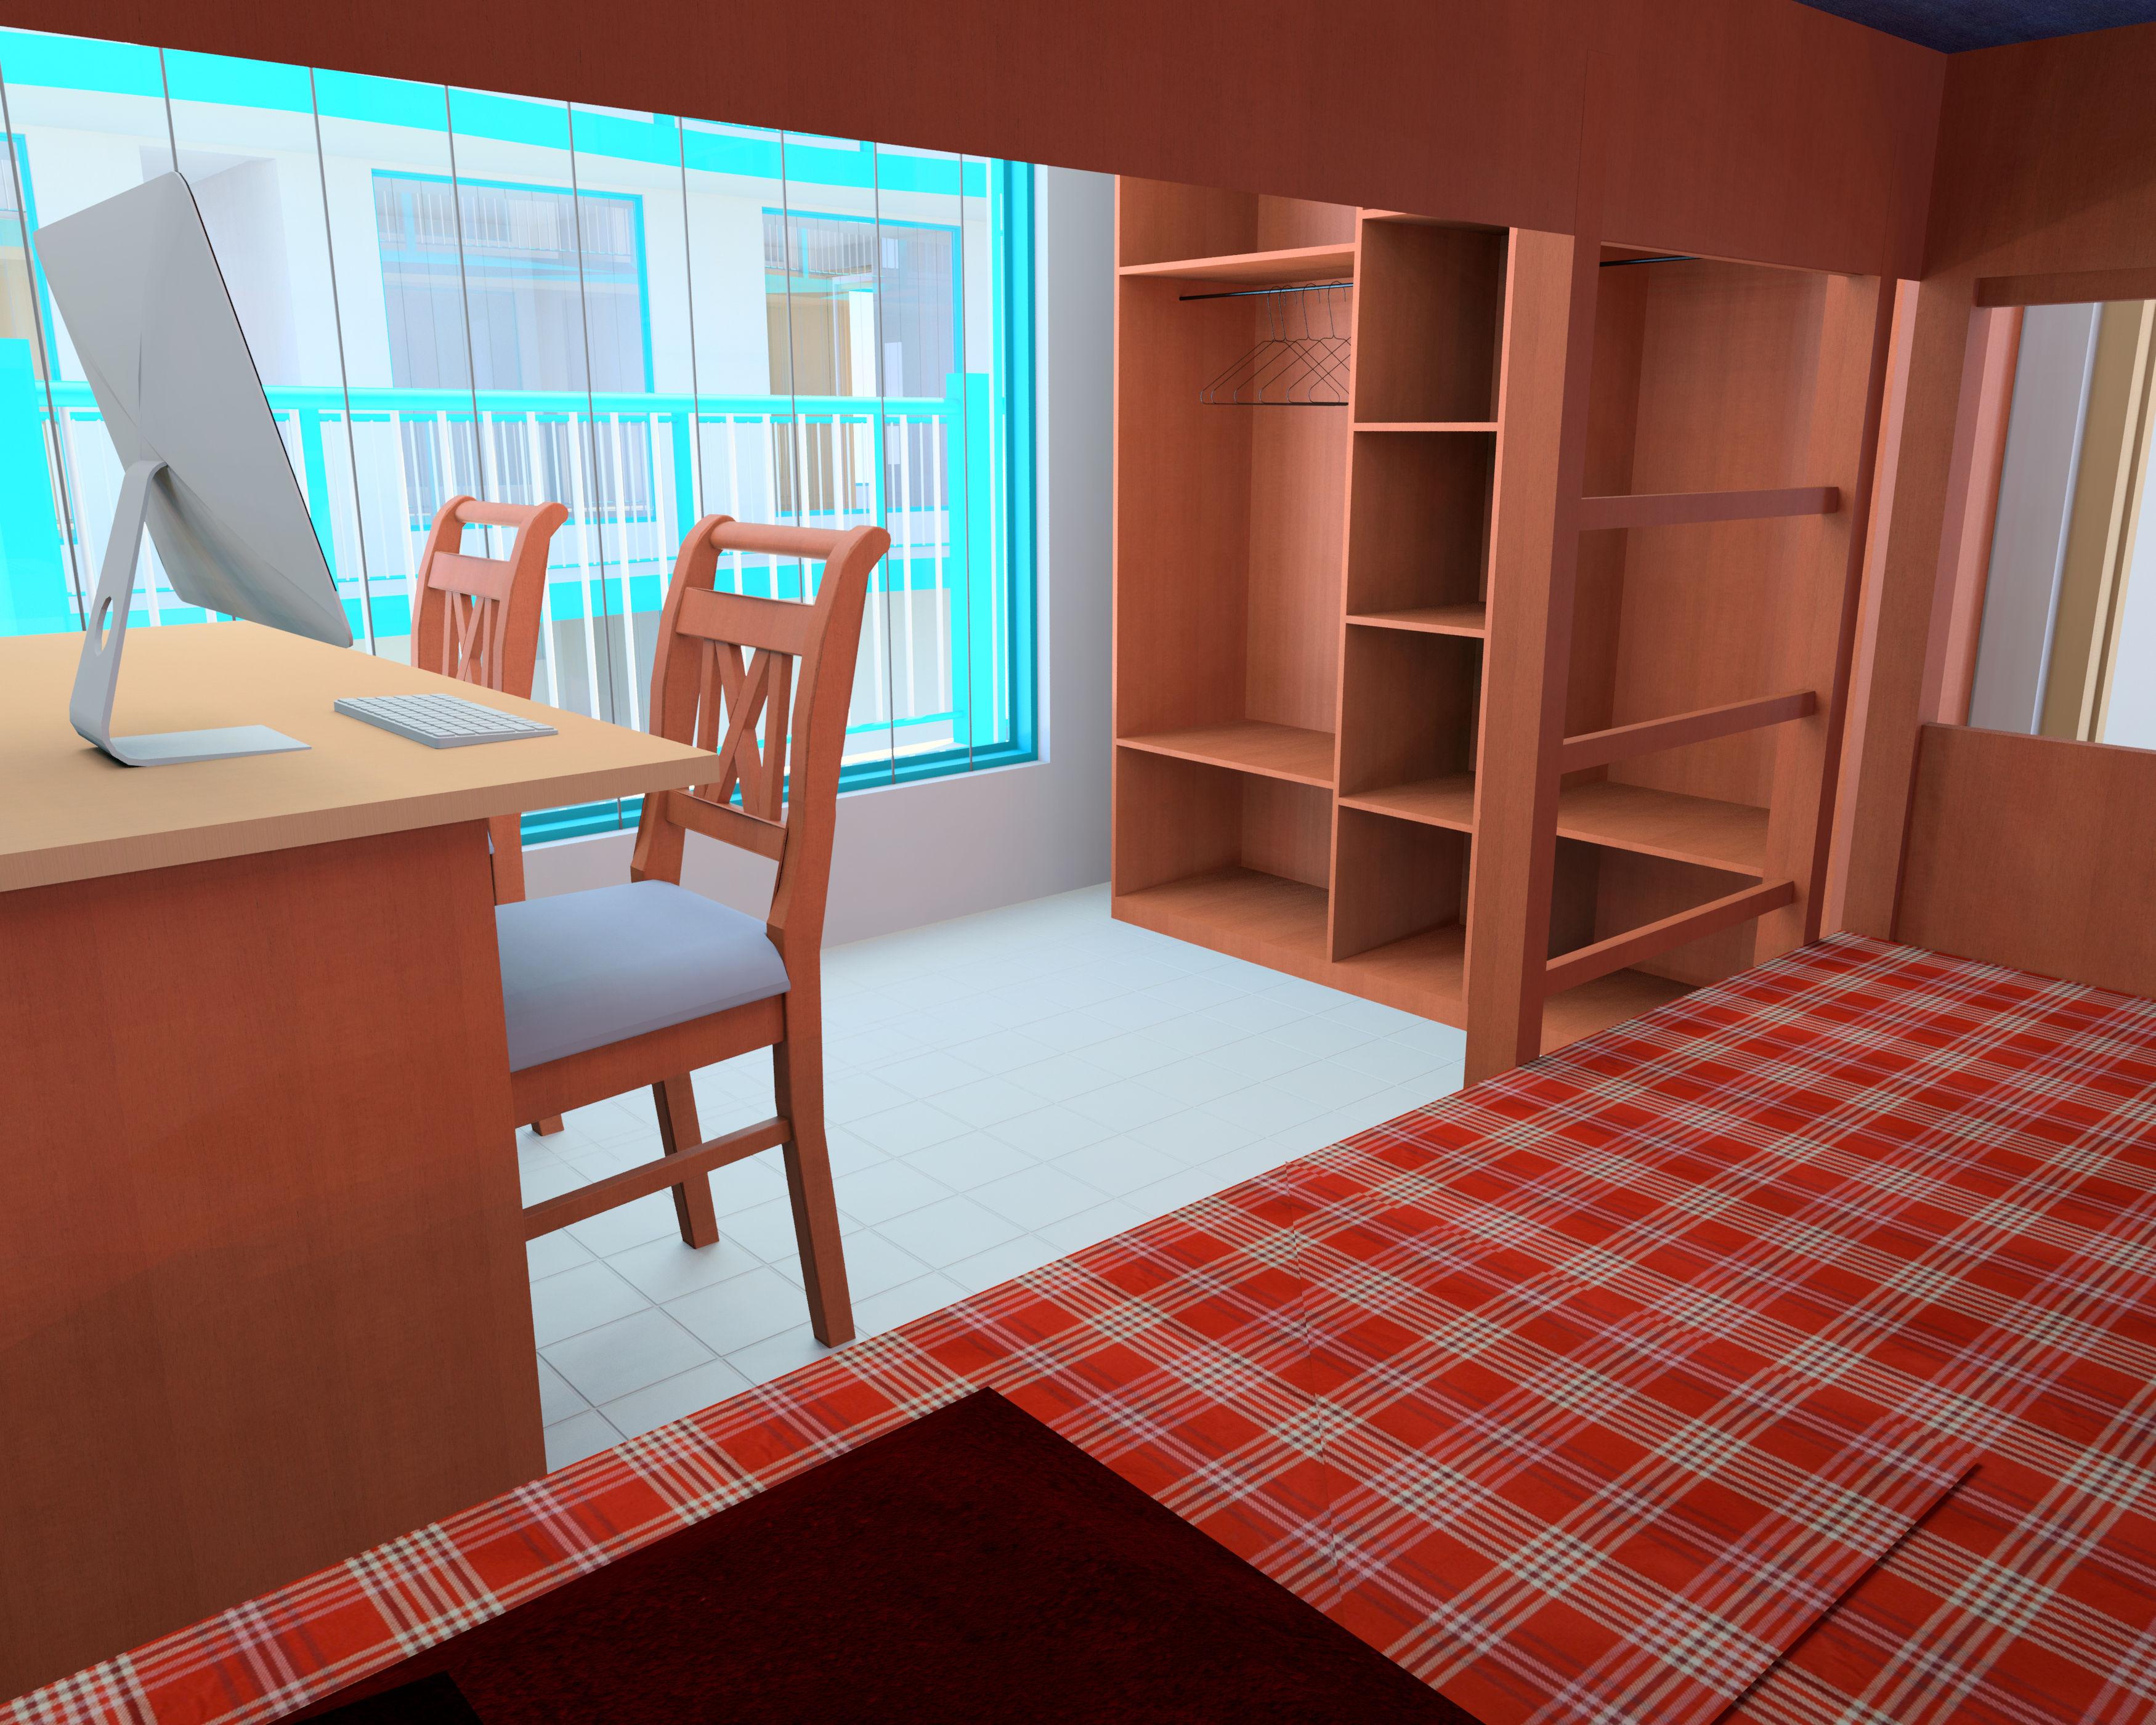 Simple interior room design of a student hostel autodesk for Minimalist student room